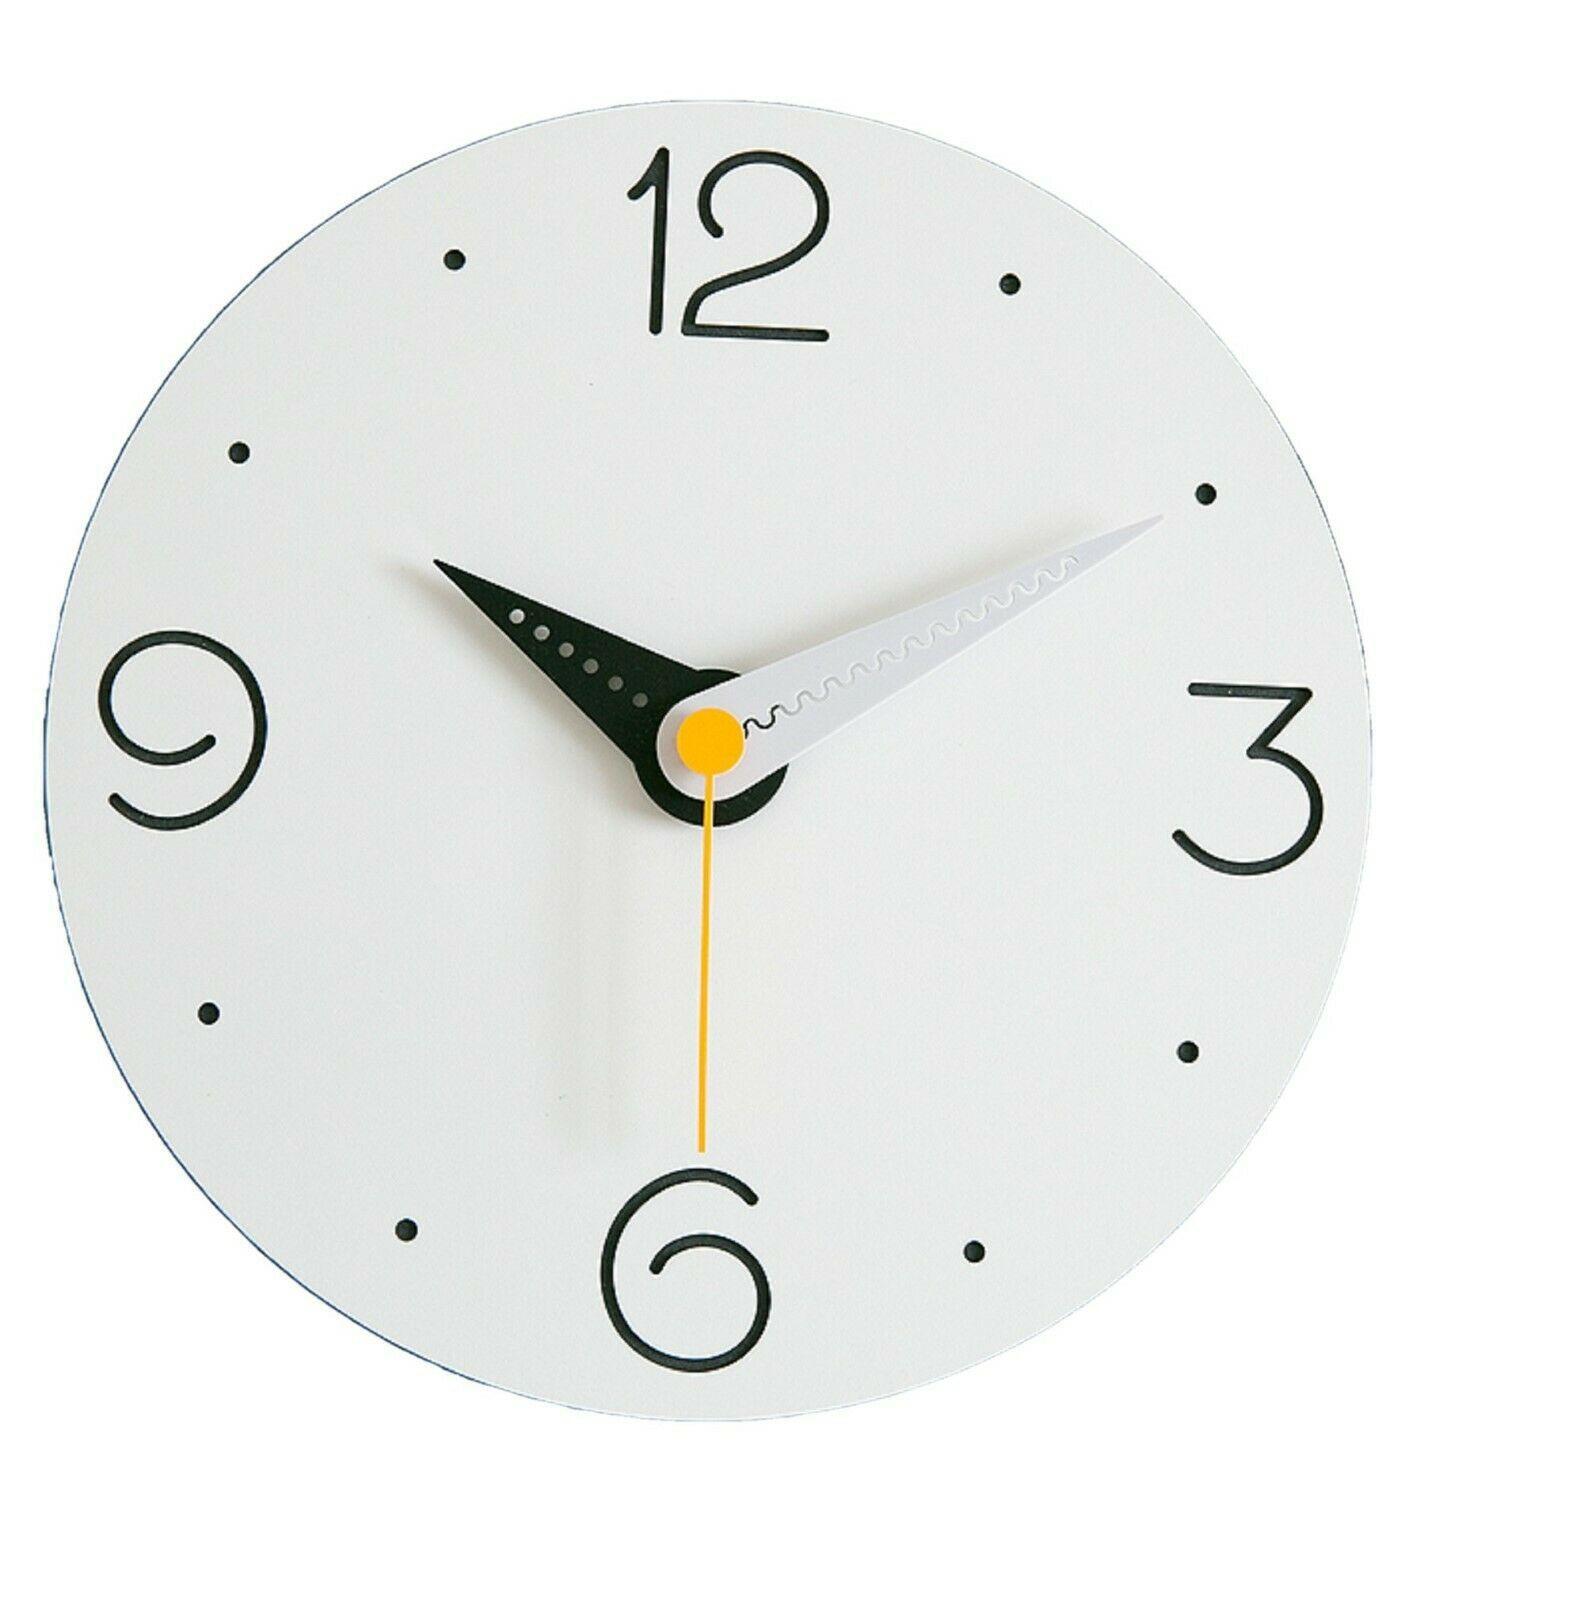 Moro Design Point Line Wall Clock non Ticking Silent Clock (Numeric Sky Blue)